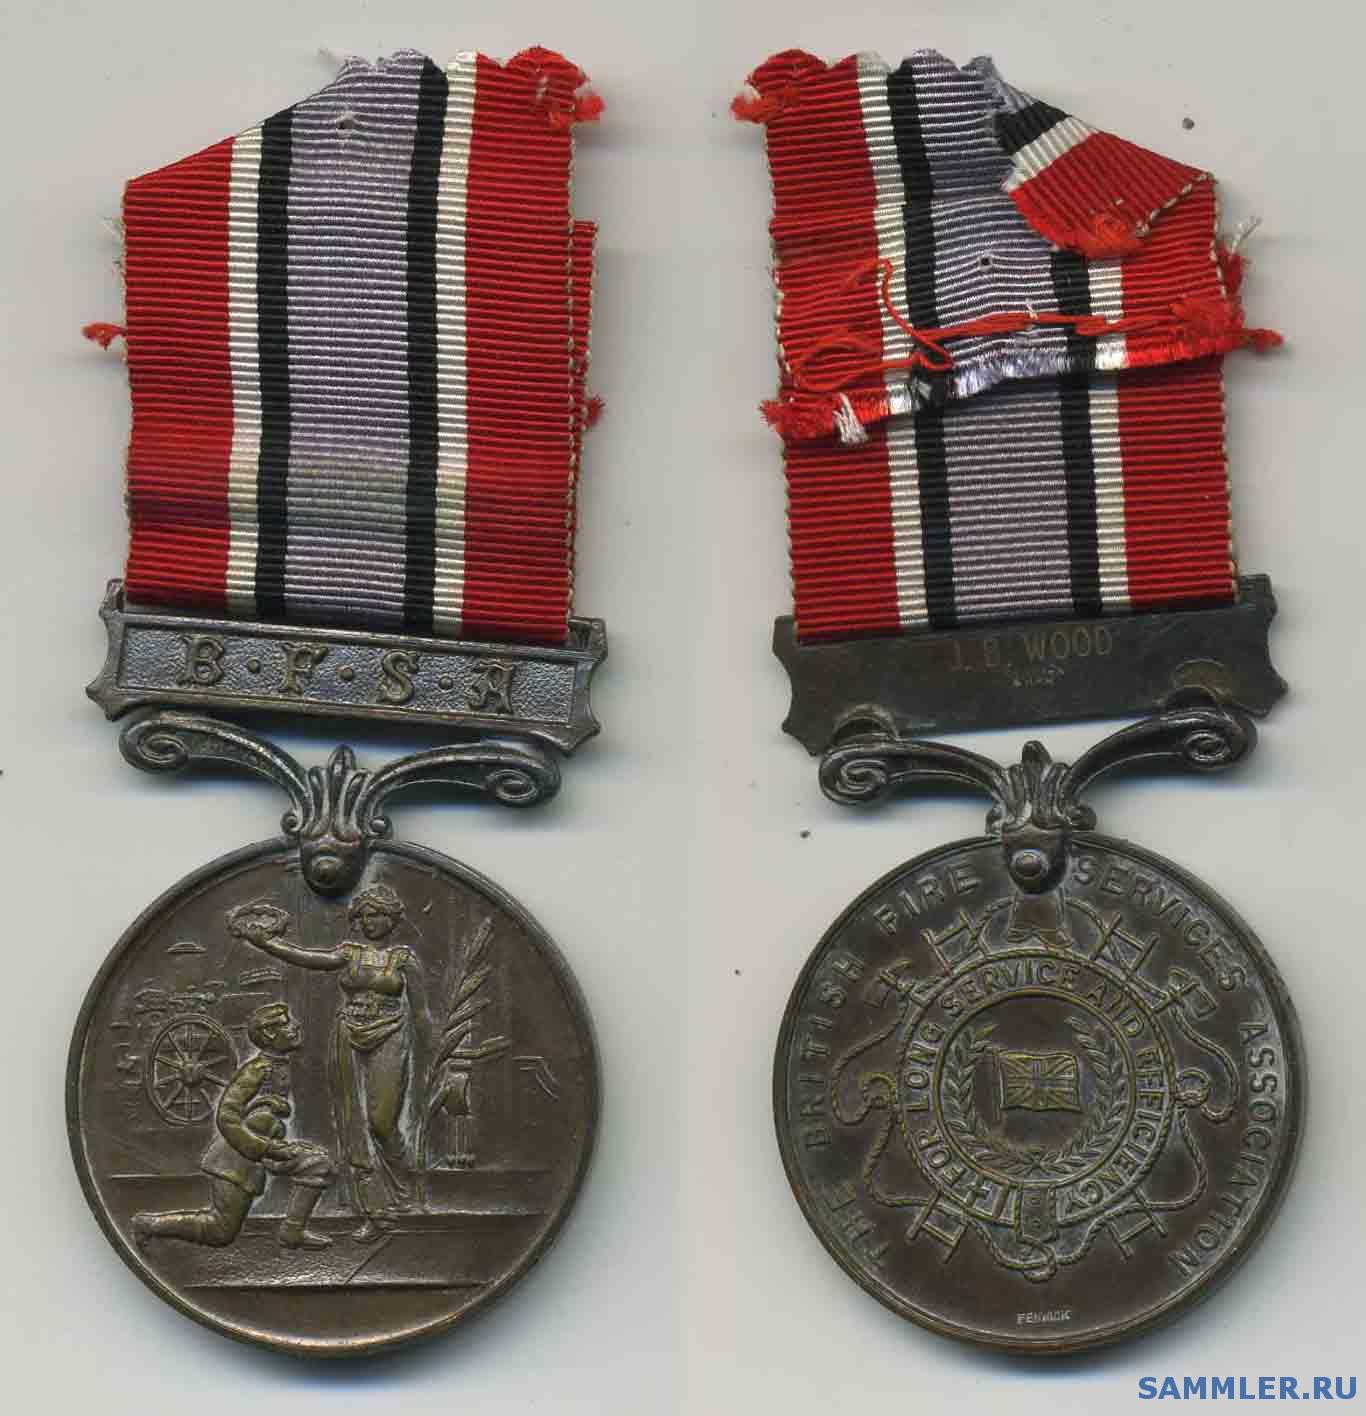 British_Fire_Services_Association_Medal_Bronze.jpg